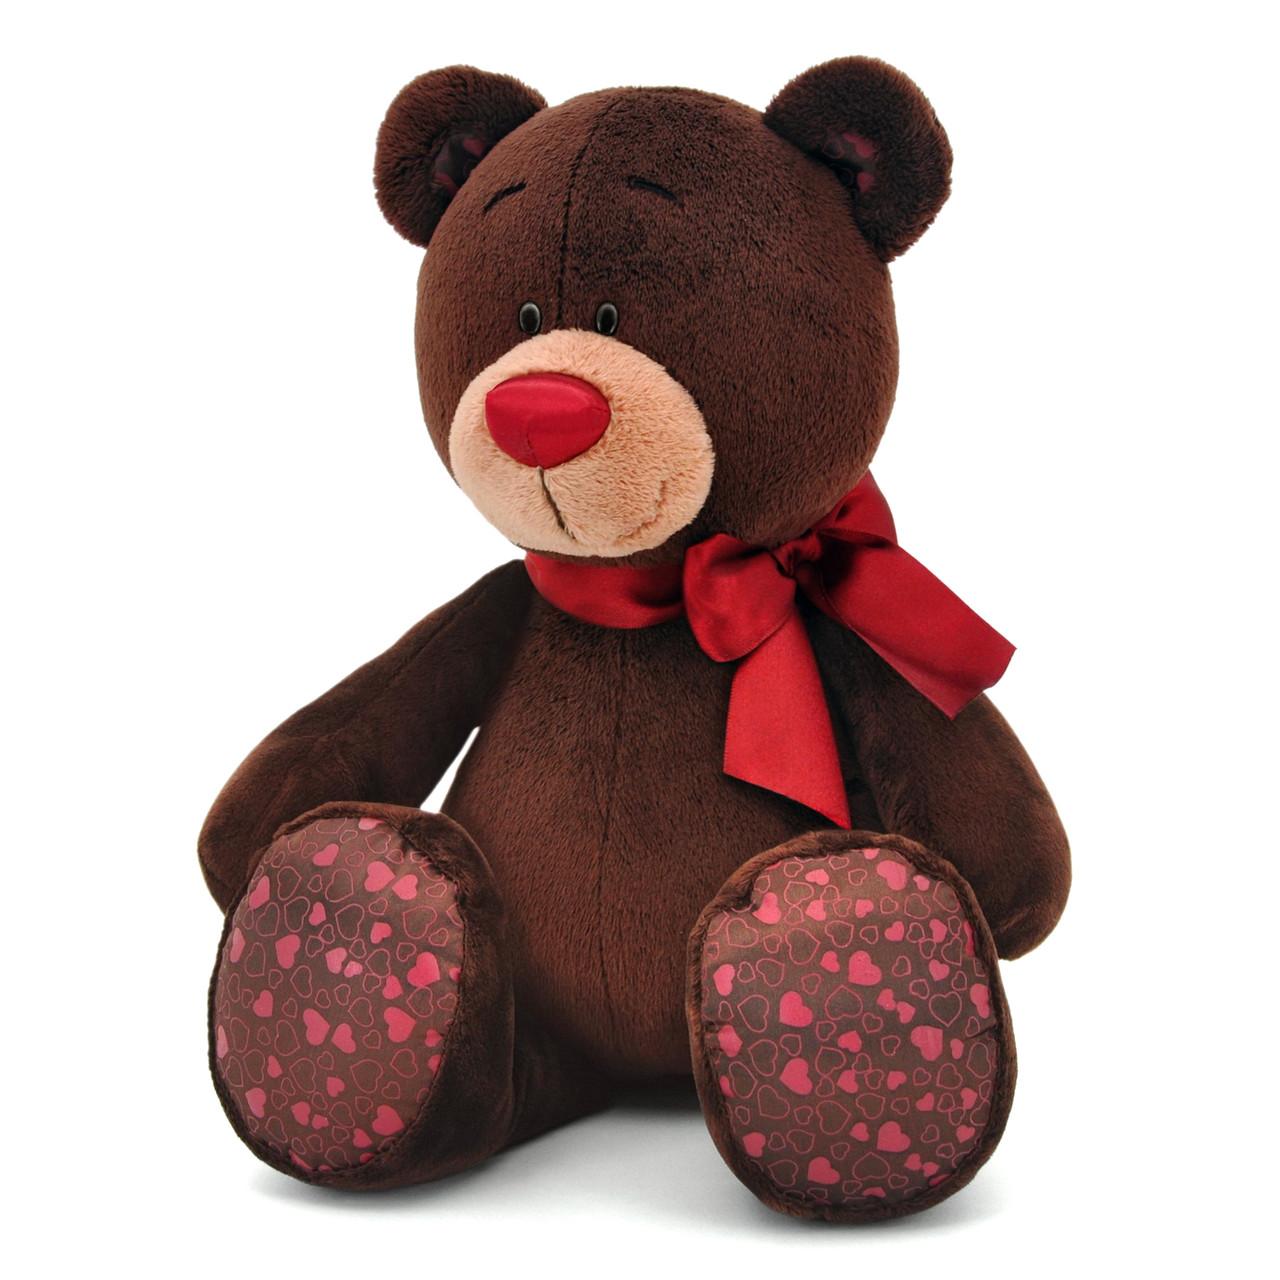 Мягкая игрушка «Orange» (C004/30) медвежонок Choco сидячий, 30 см